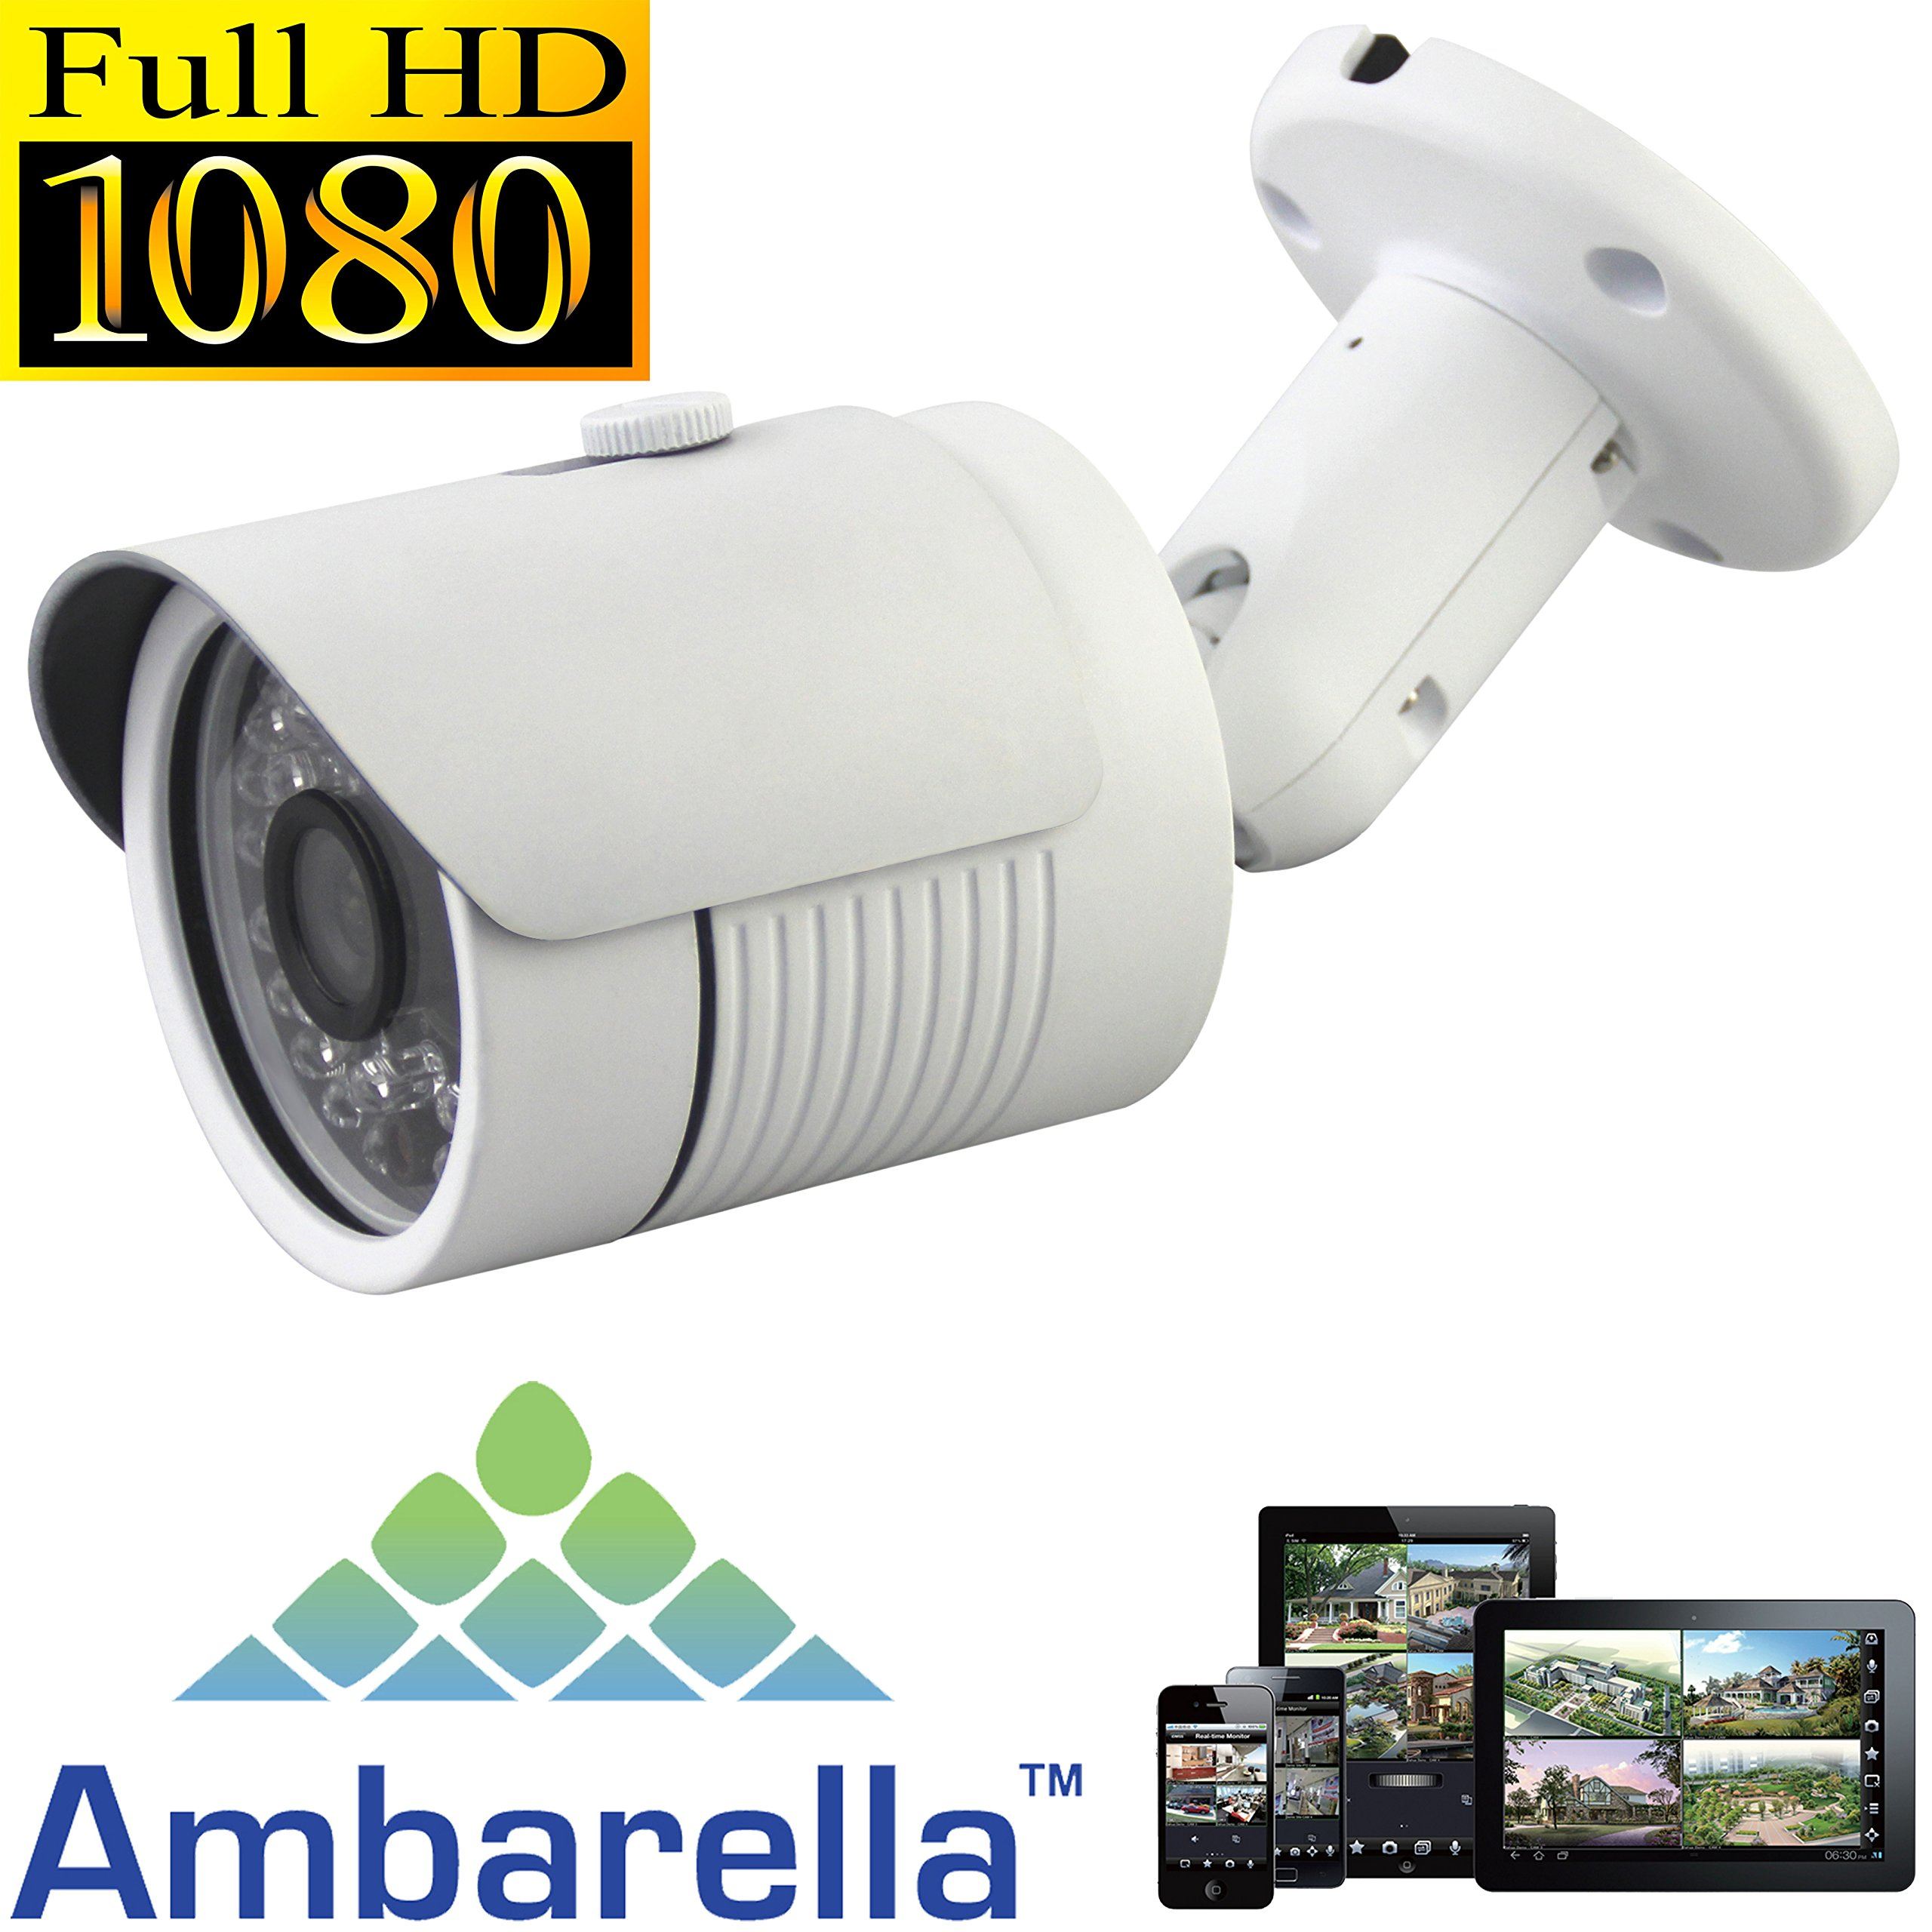 USG Sony + Ambarella DSP 2.4MP 1080P HD-IP Network Bullet Security Camera - 3.6mm Wide Angle Lens - Home/Business Video Surveillance - Outdoor/Indoor IP66 Weatherproof Vandalproof 24x IR LEDs